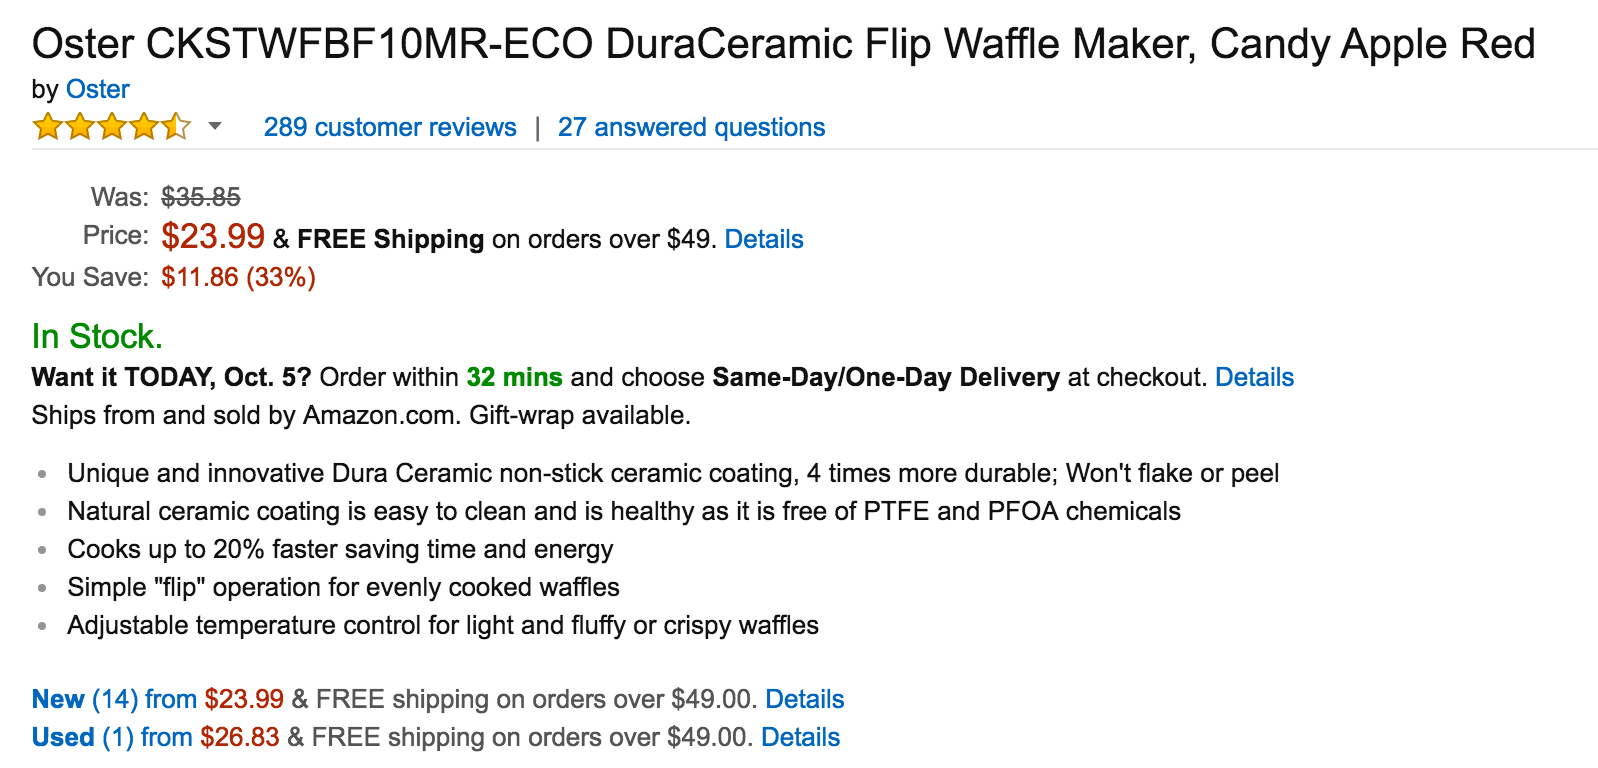 oster-duraceramic-flip-waffle-maker-2